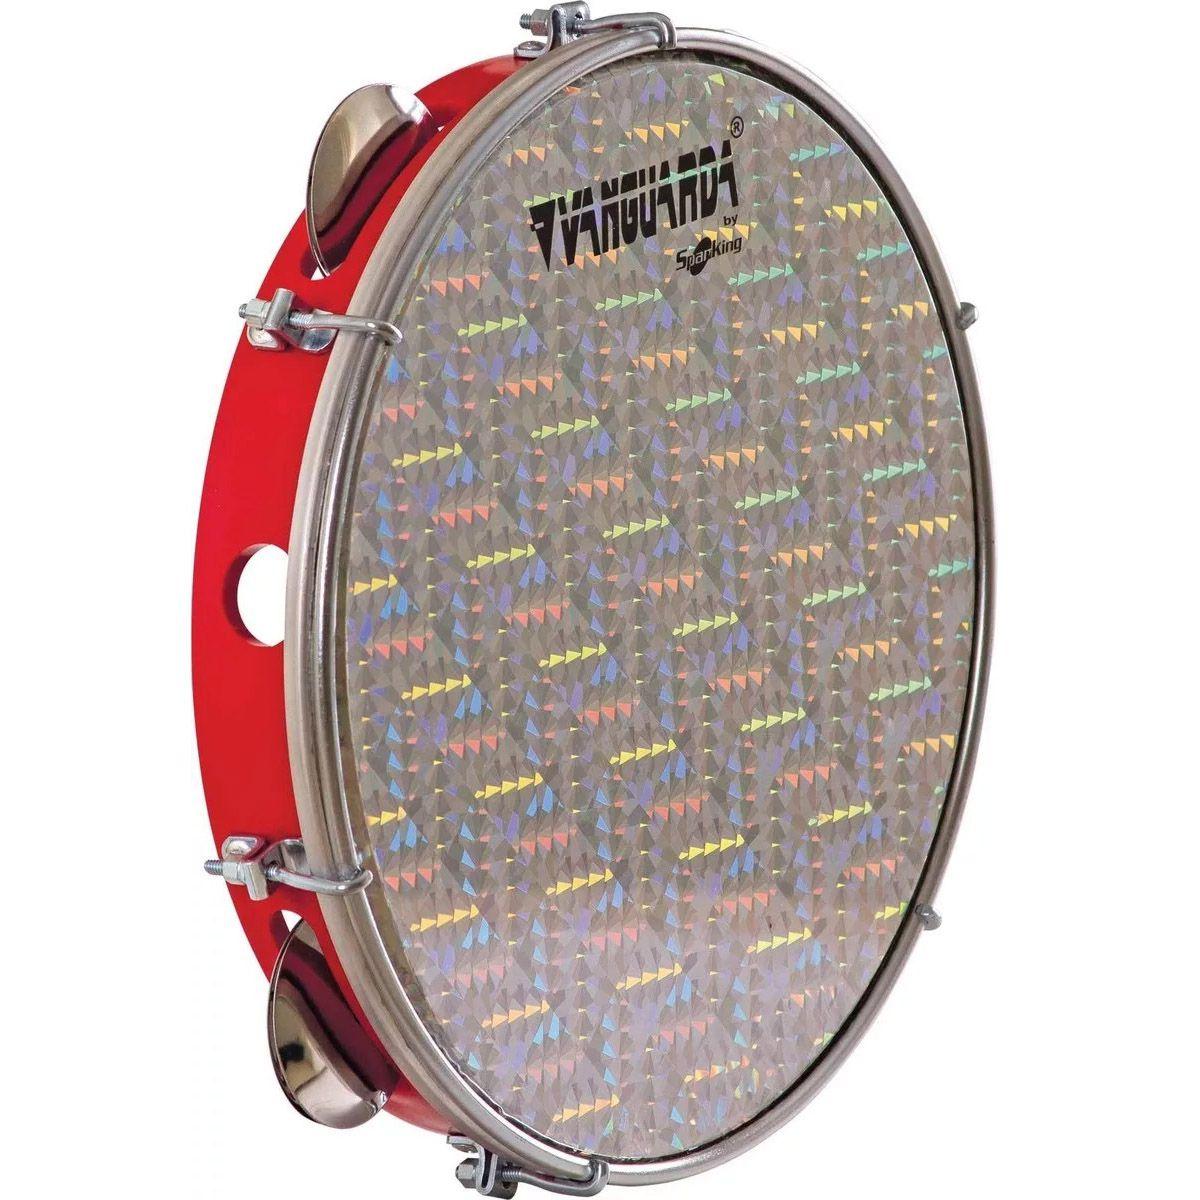 Pandeiro Spanking 10 Aro ABS Vermelho Pele Holográfica Prata